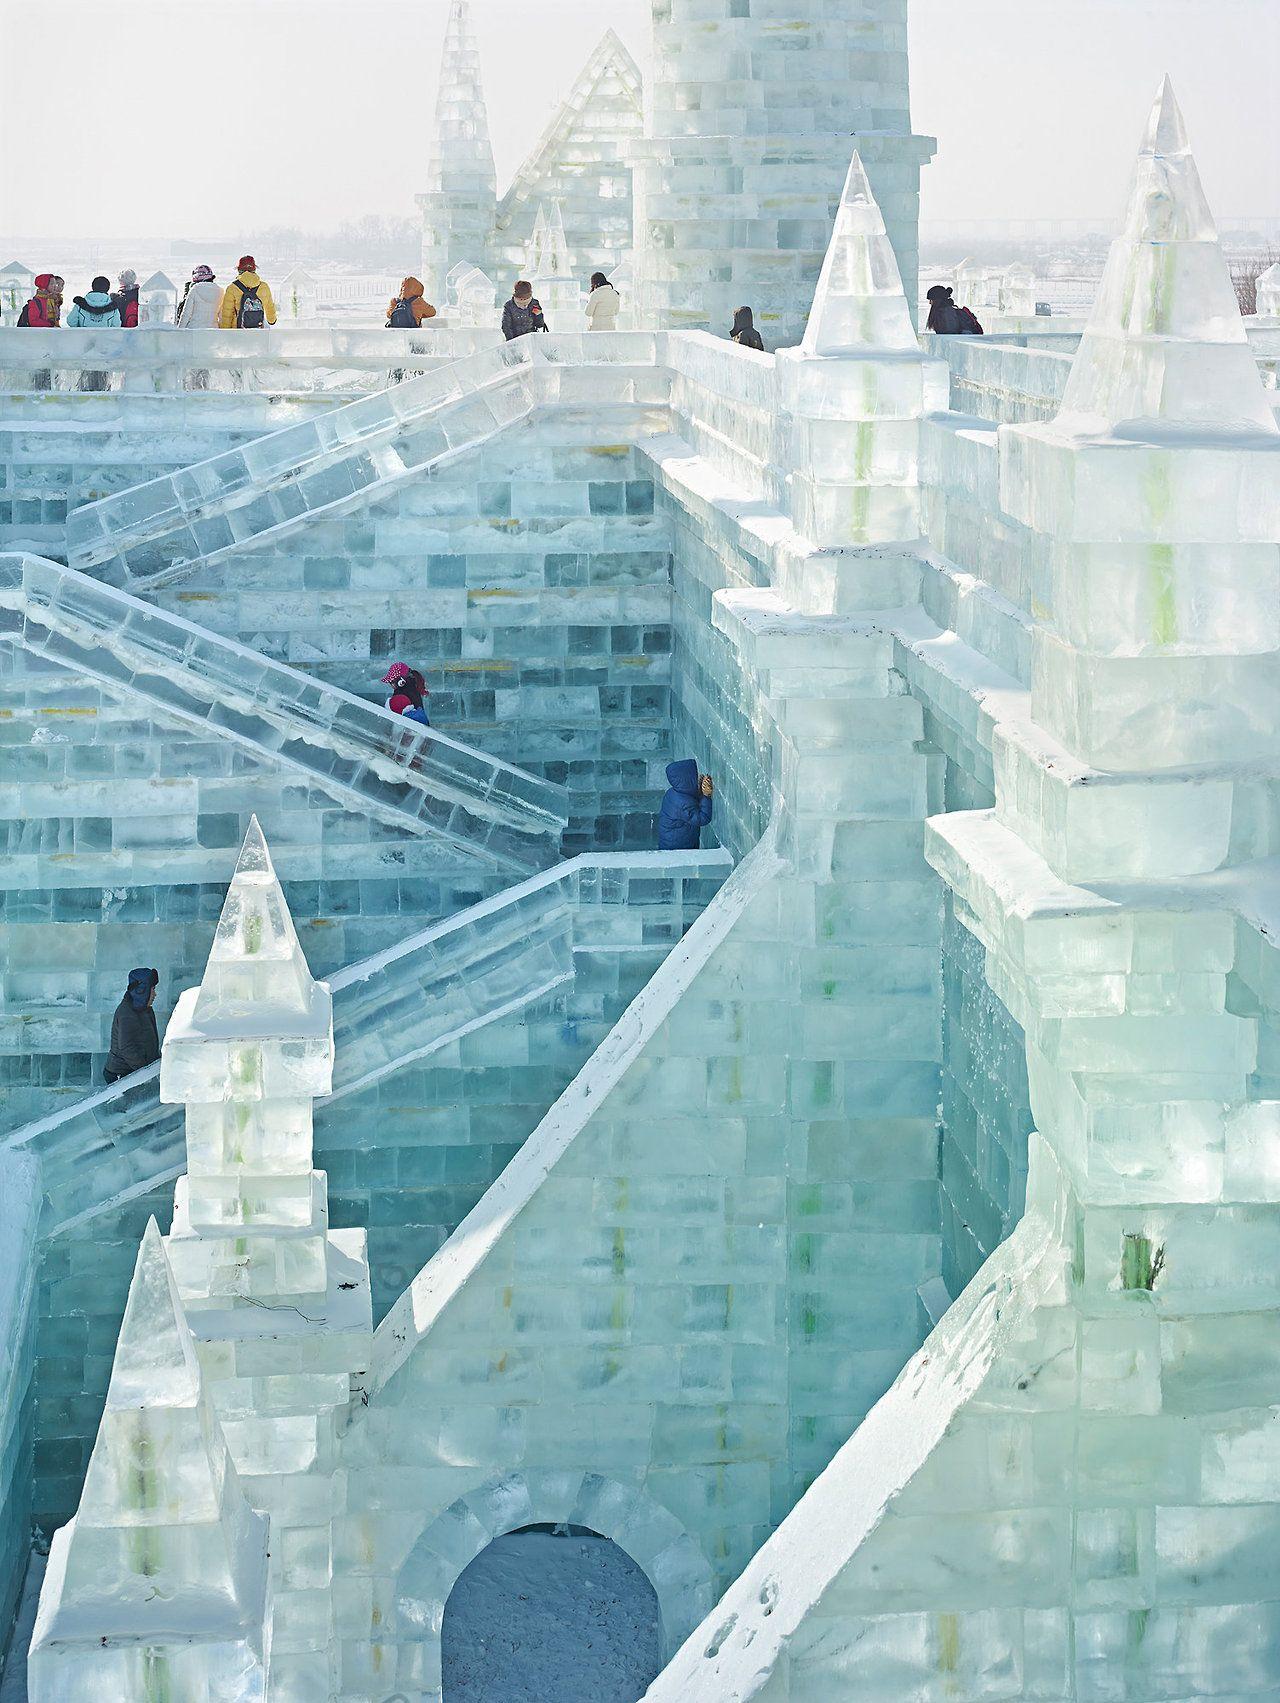 Sightseers Harbin International Ice And Snow